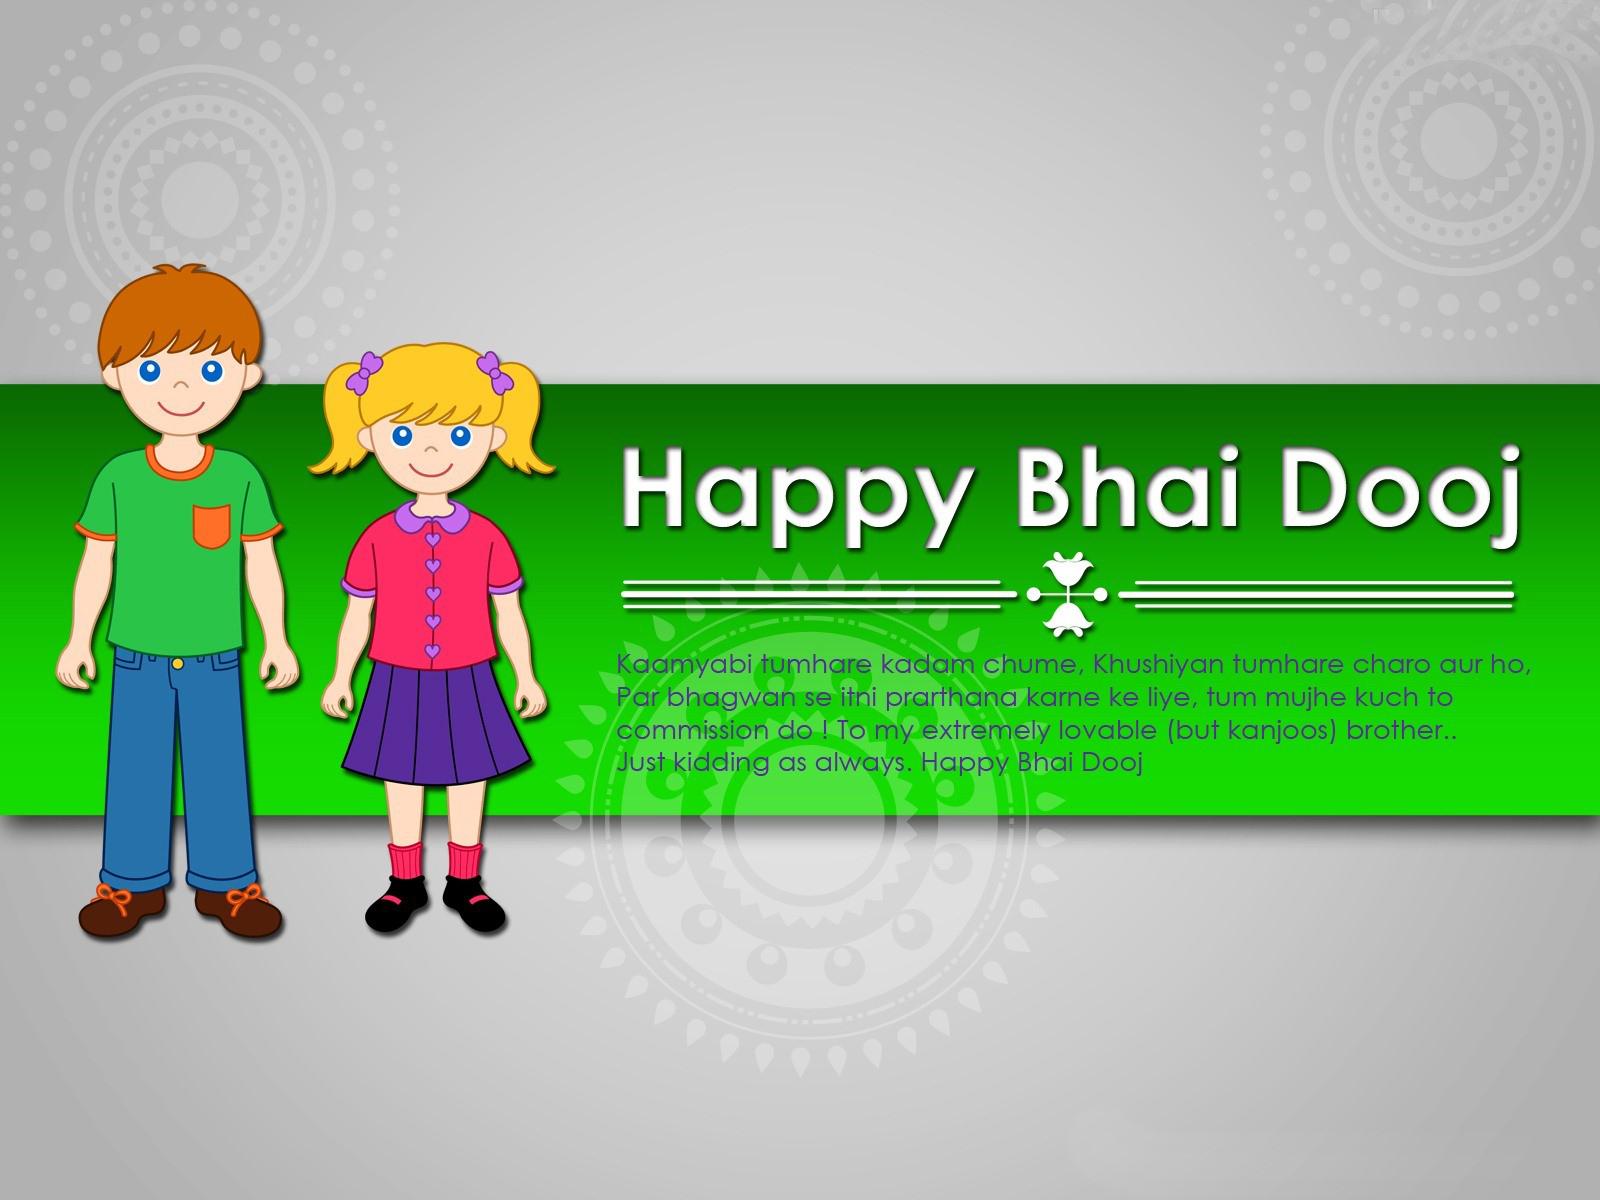 Wallpaper download karne - Bhai Dooj Hd Wallpaper